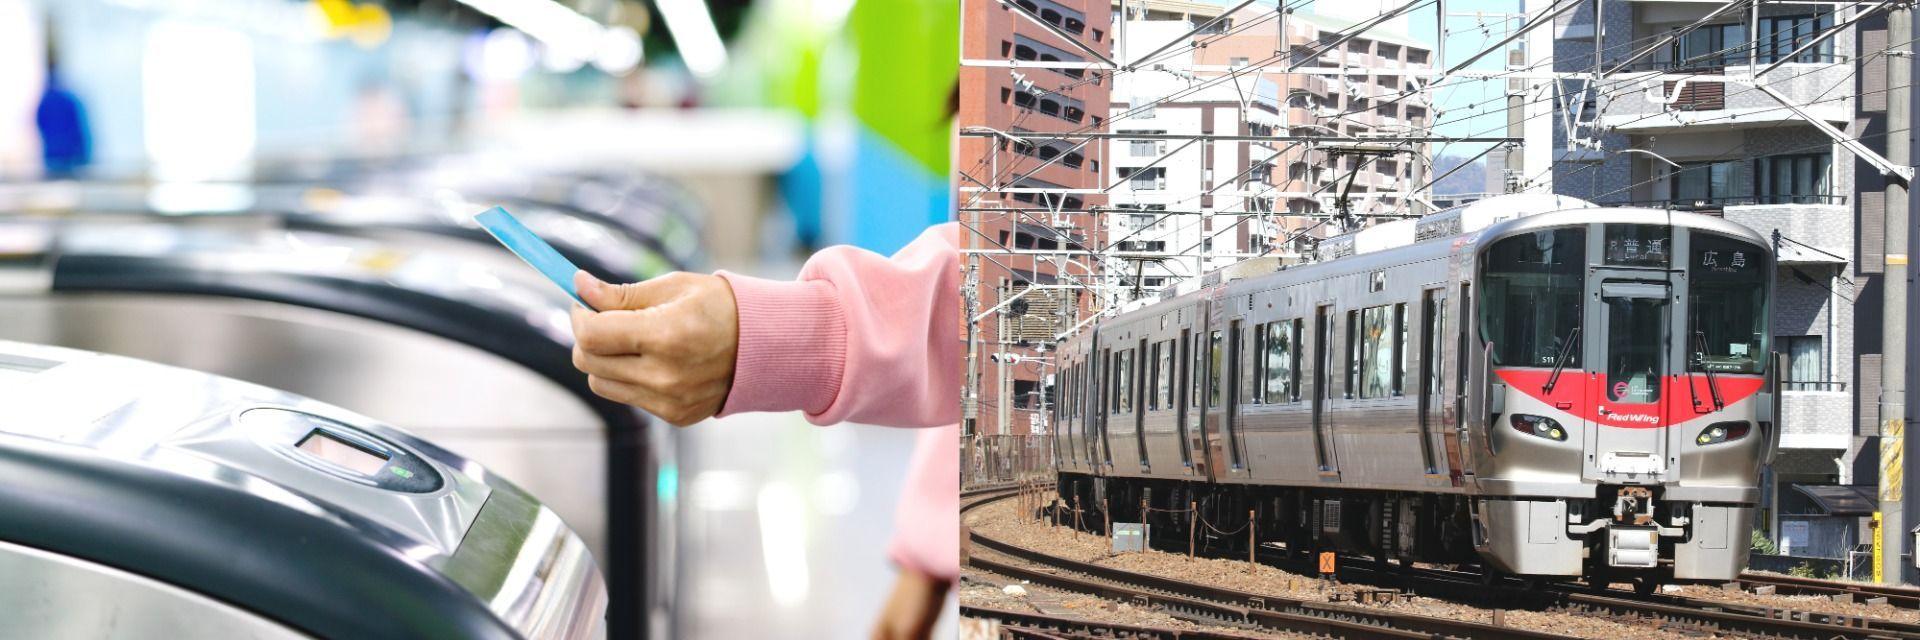 Enjoy Cost-efficient Travel Between Popular Kansai Spots and Hiroshima with Travel Free Passes!